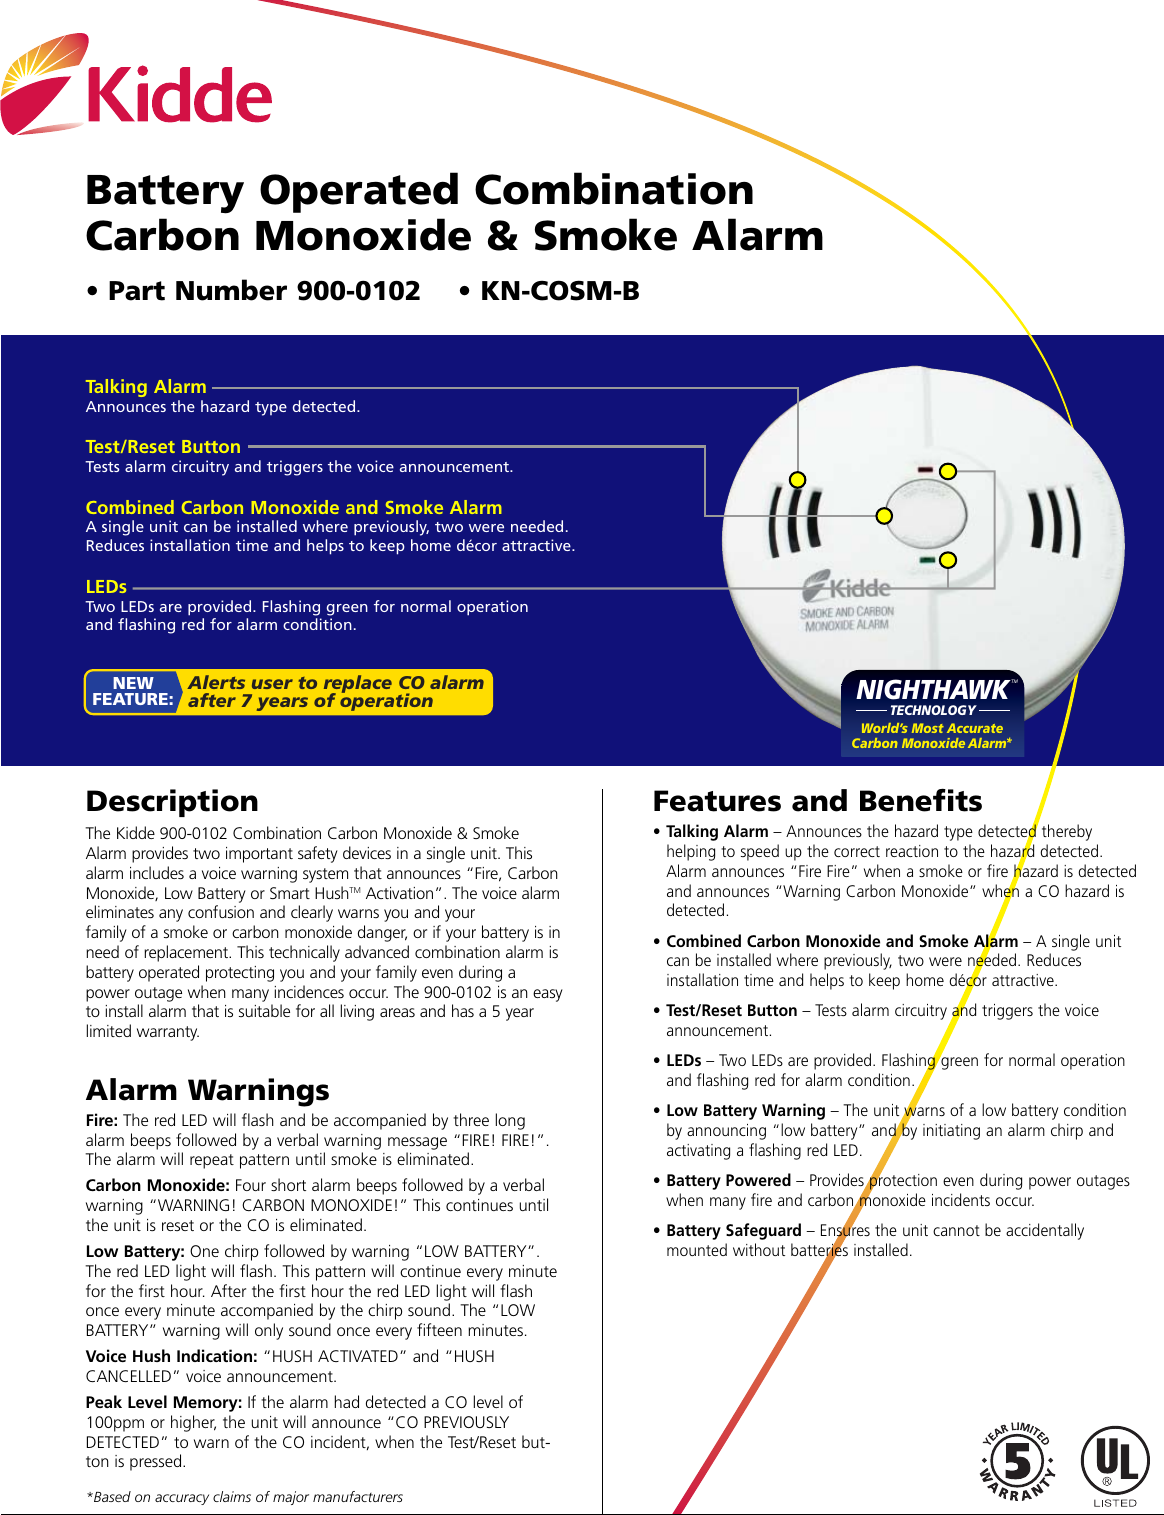 Kidde KN COSM B 900 0102 Sheet User Manual To The 497d1e36 c709 4b42 a47d  0d6c53cfd0be